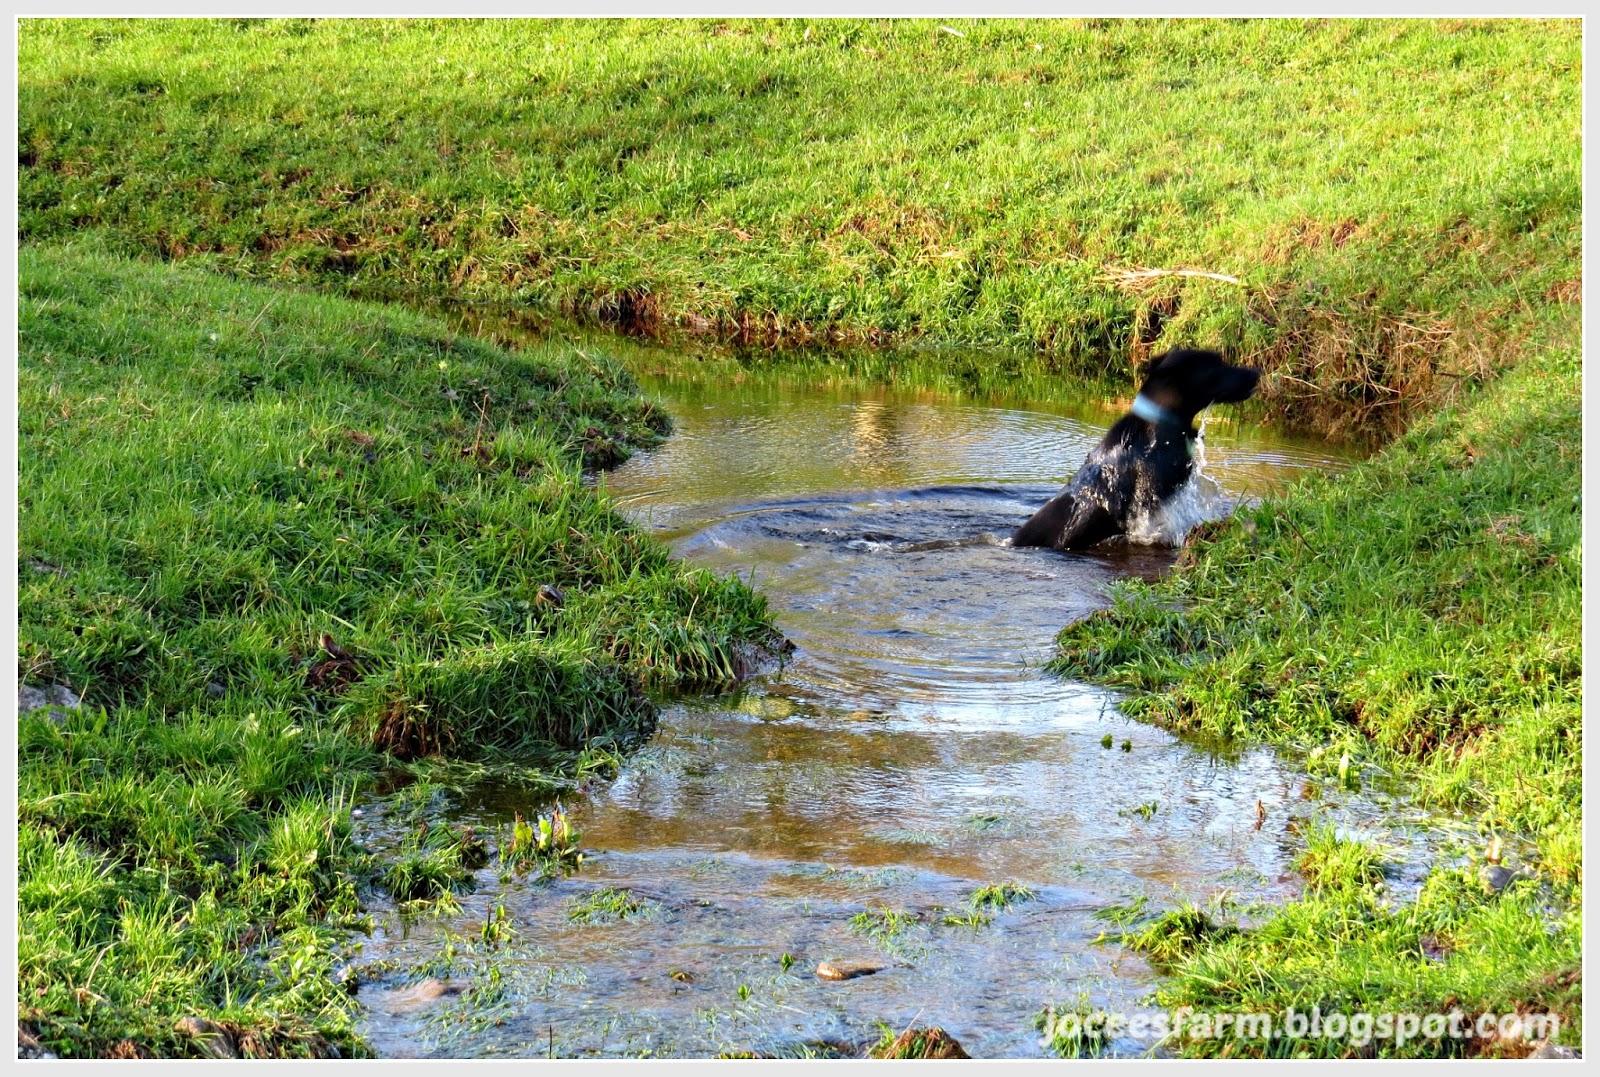 Autumn Rain | joceesfarm.blogspot.com